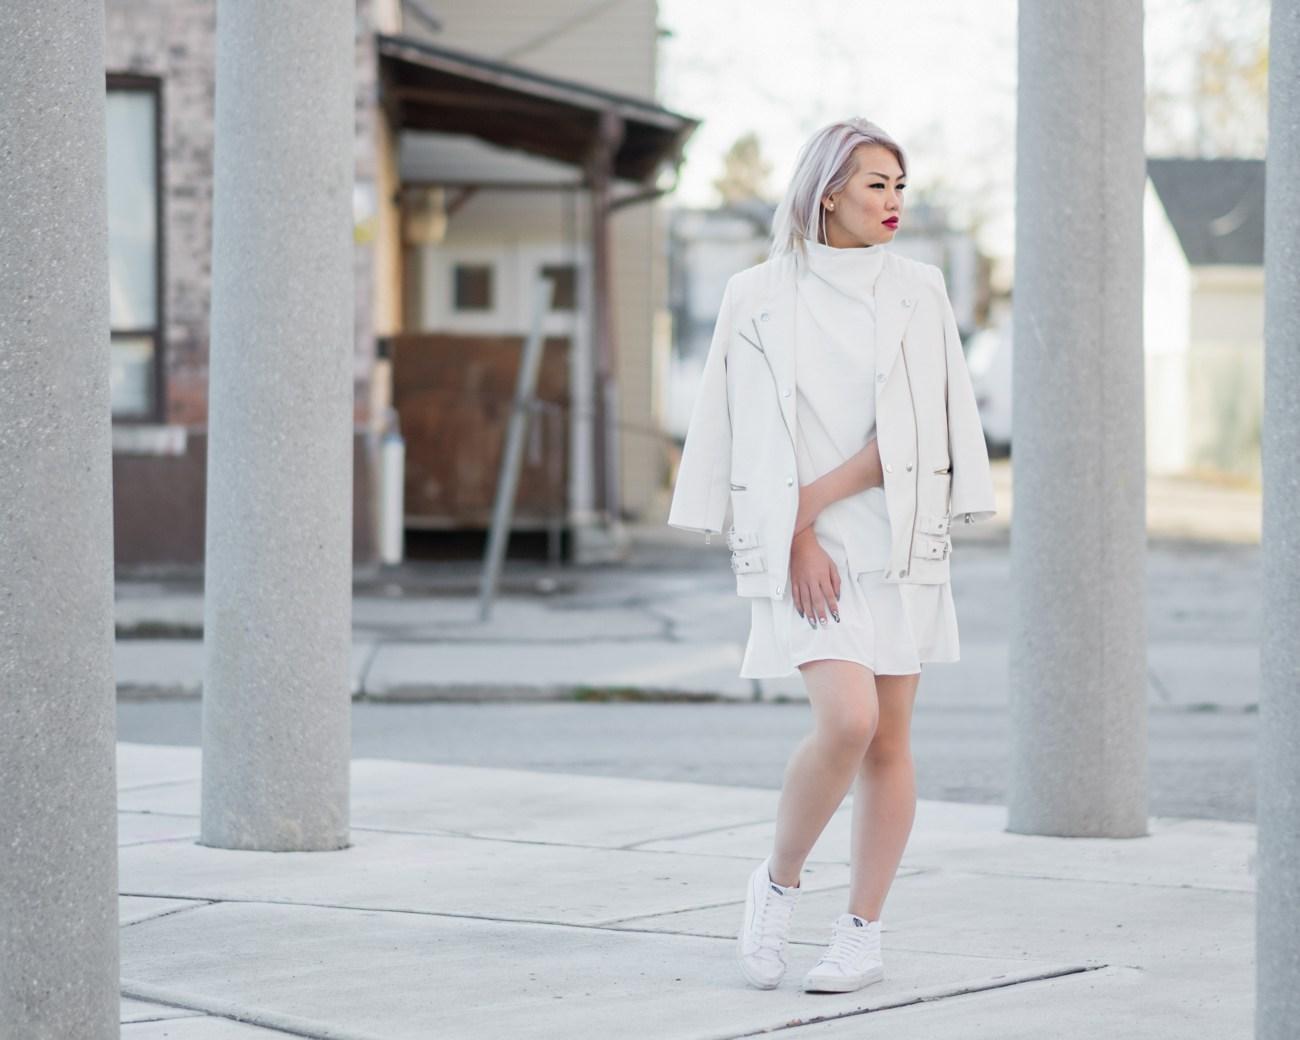 #FeatureFriday: Vyvian To, Stylist | www.styledomination.com